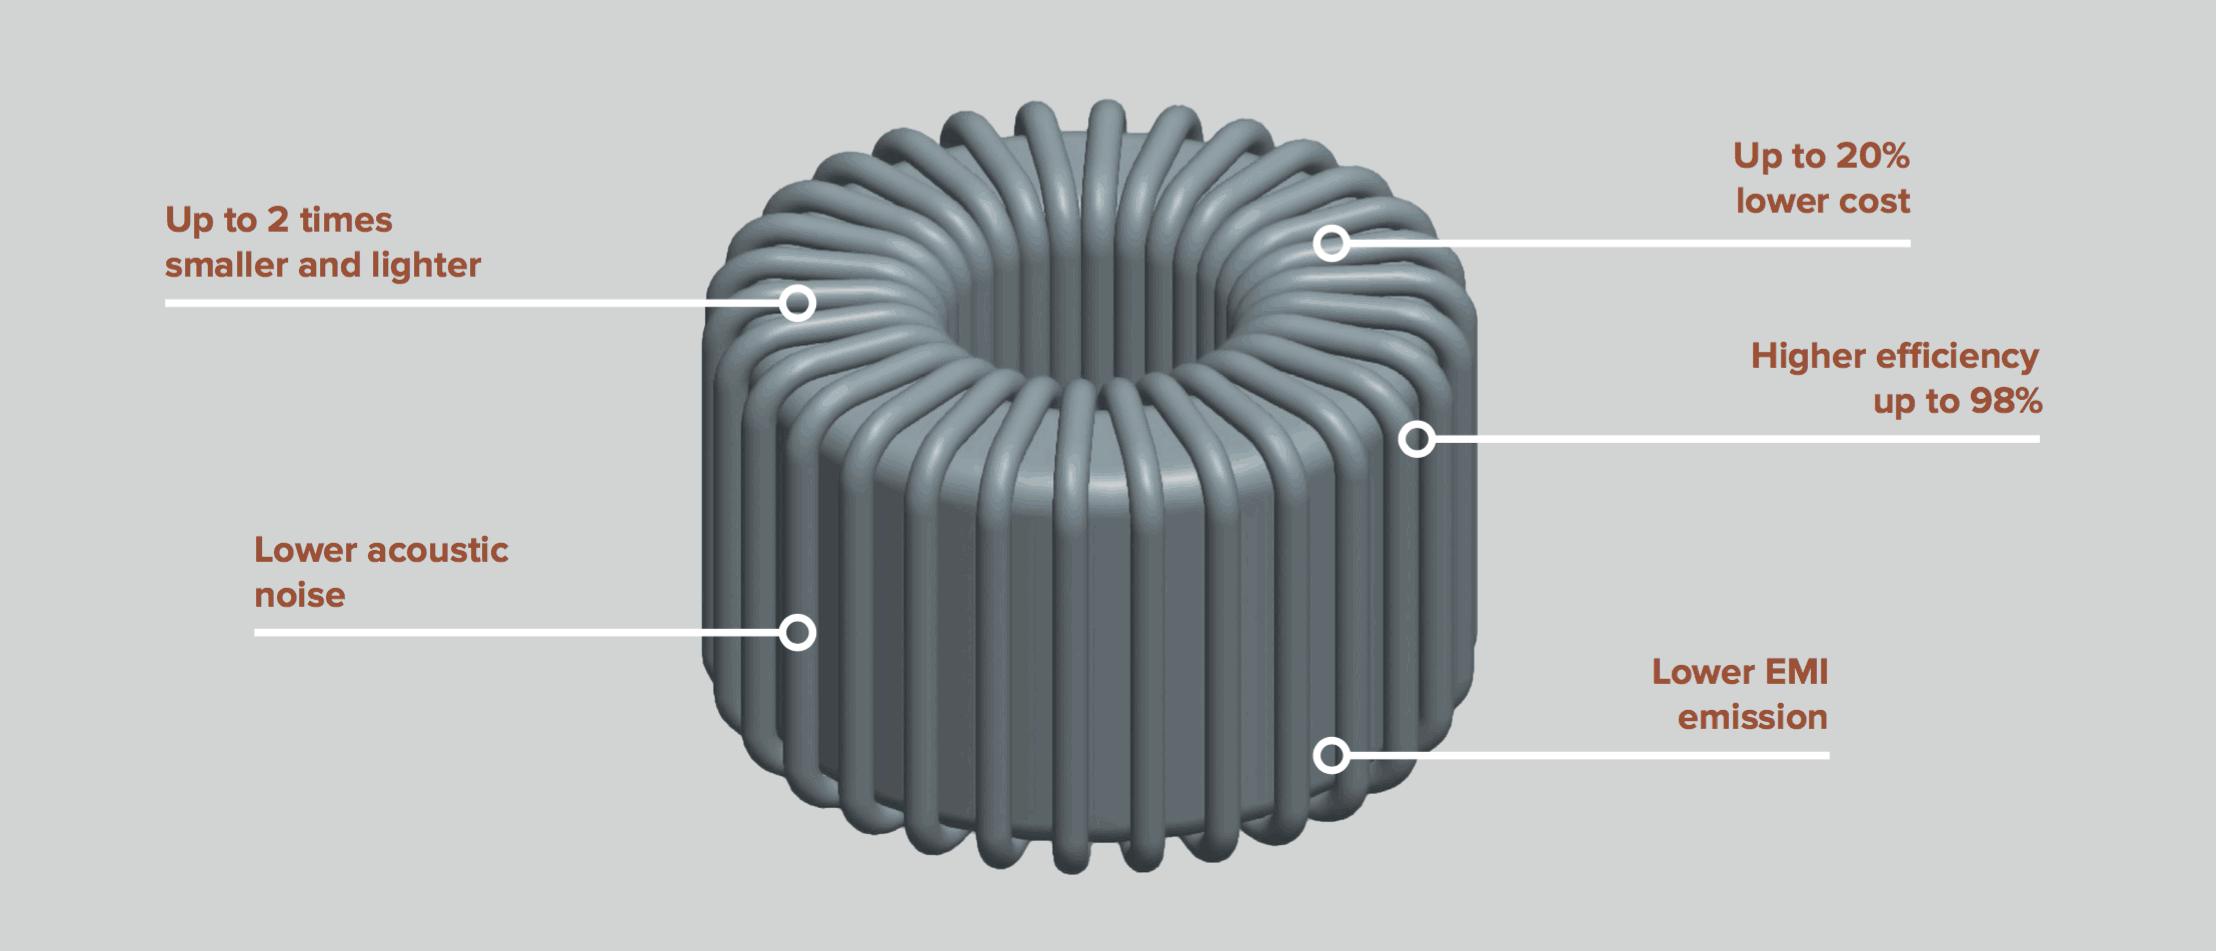 Traftor-toroidal-solutions--1024x448